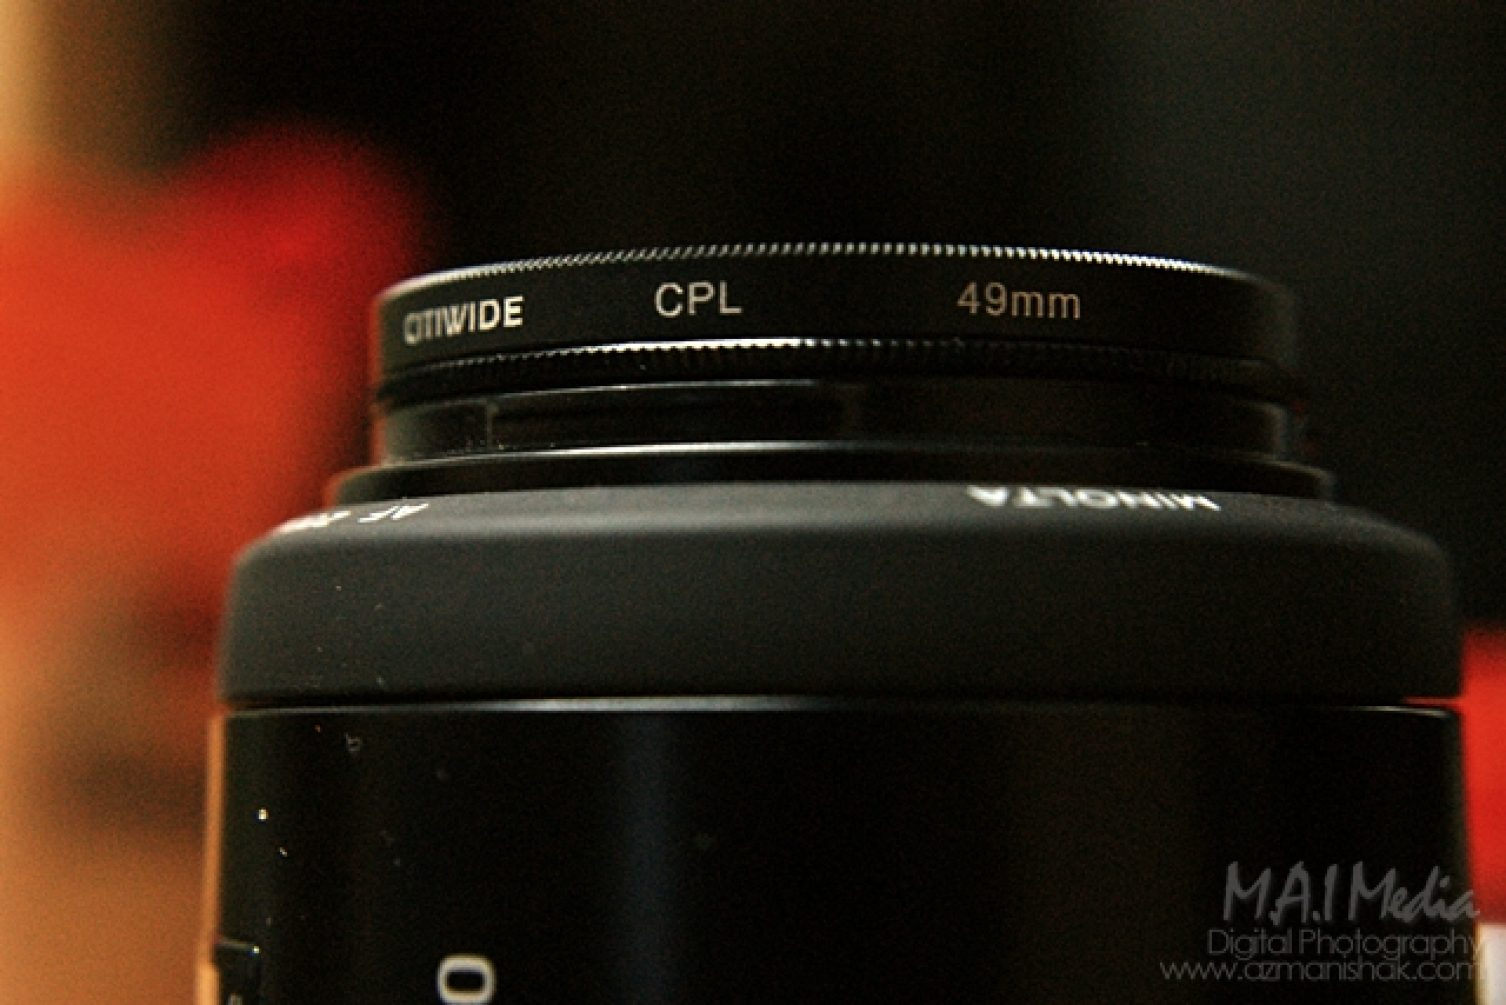 Membeli lense filter di DLSRplaza.com